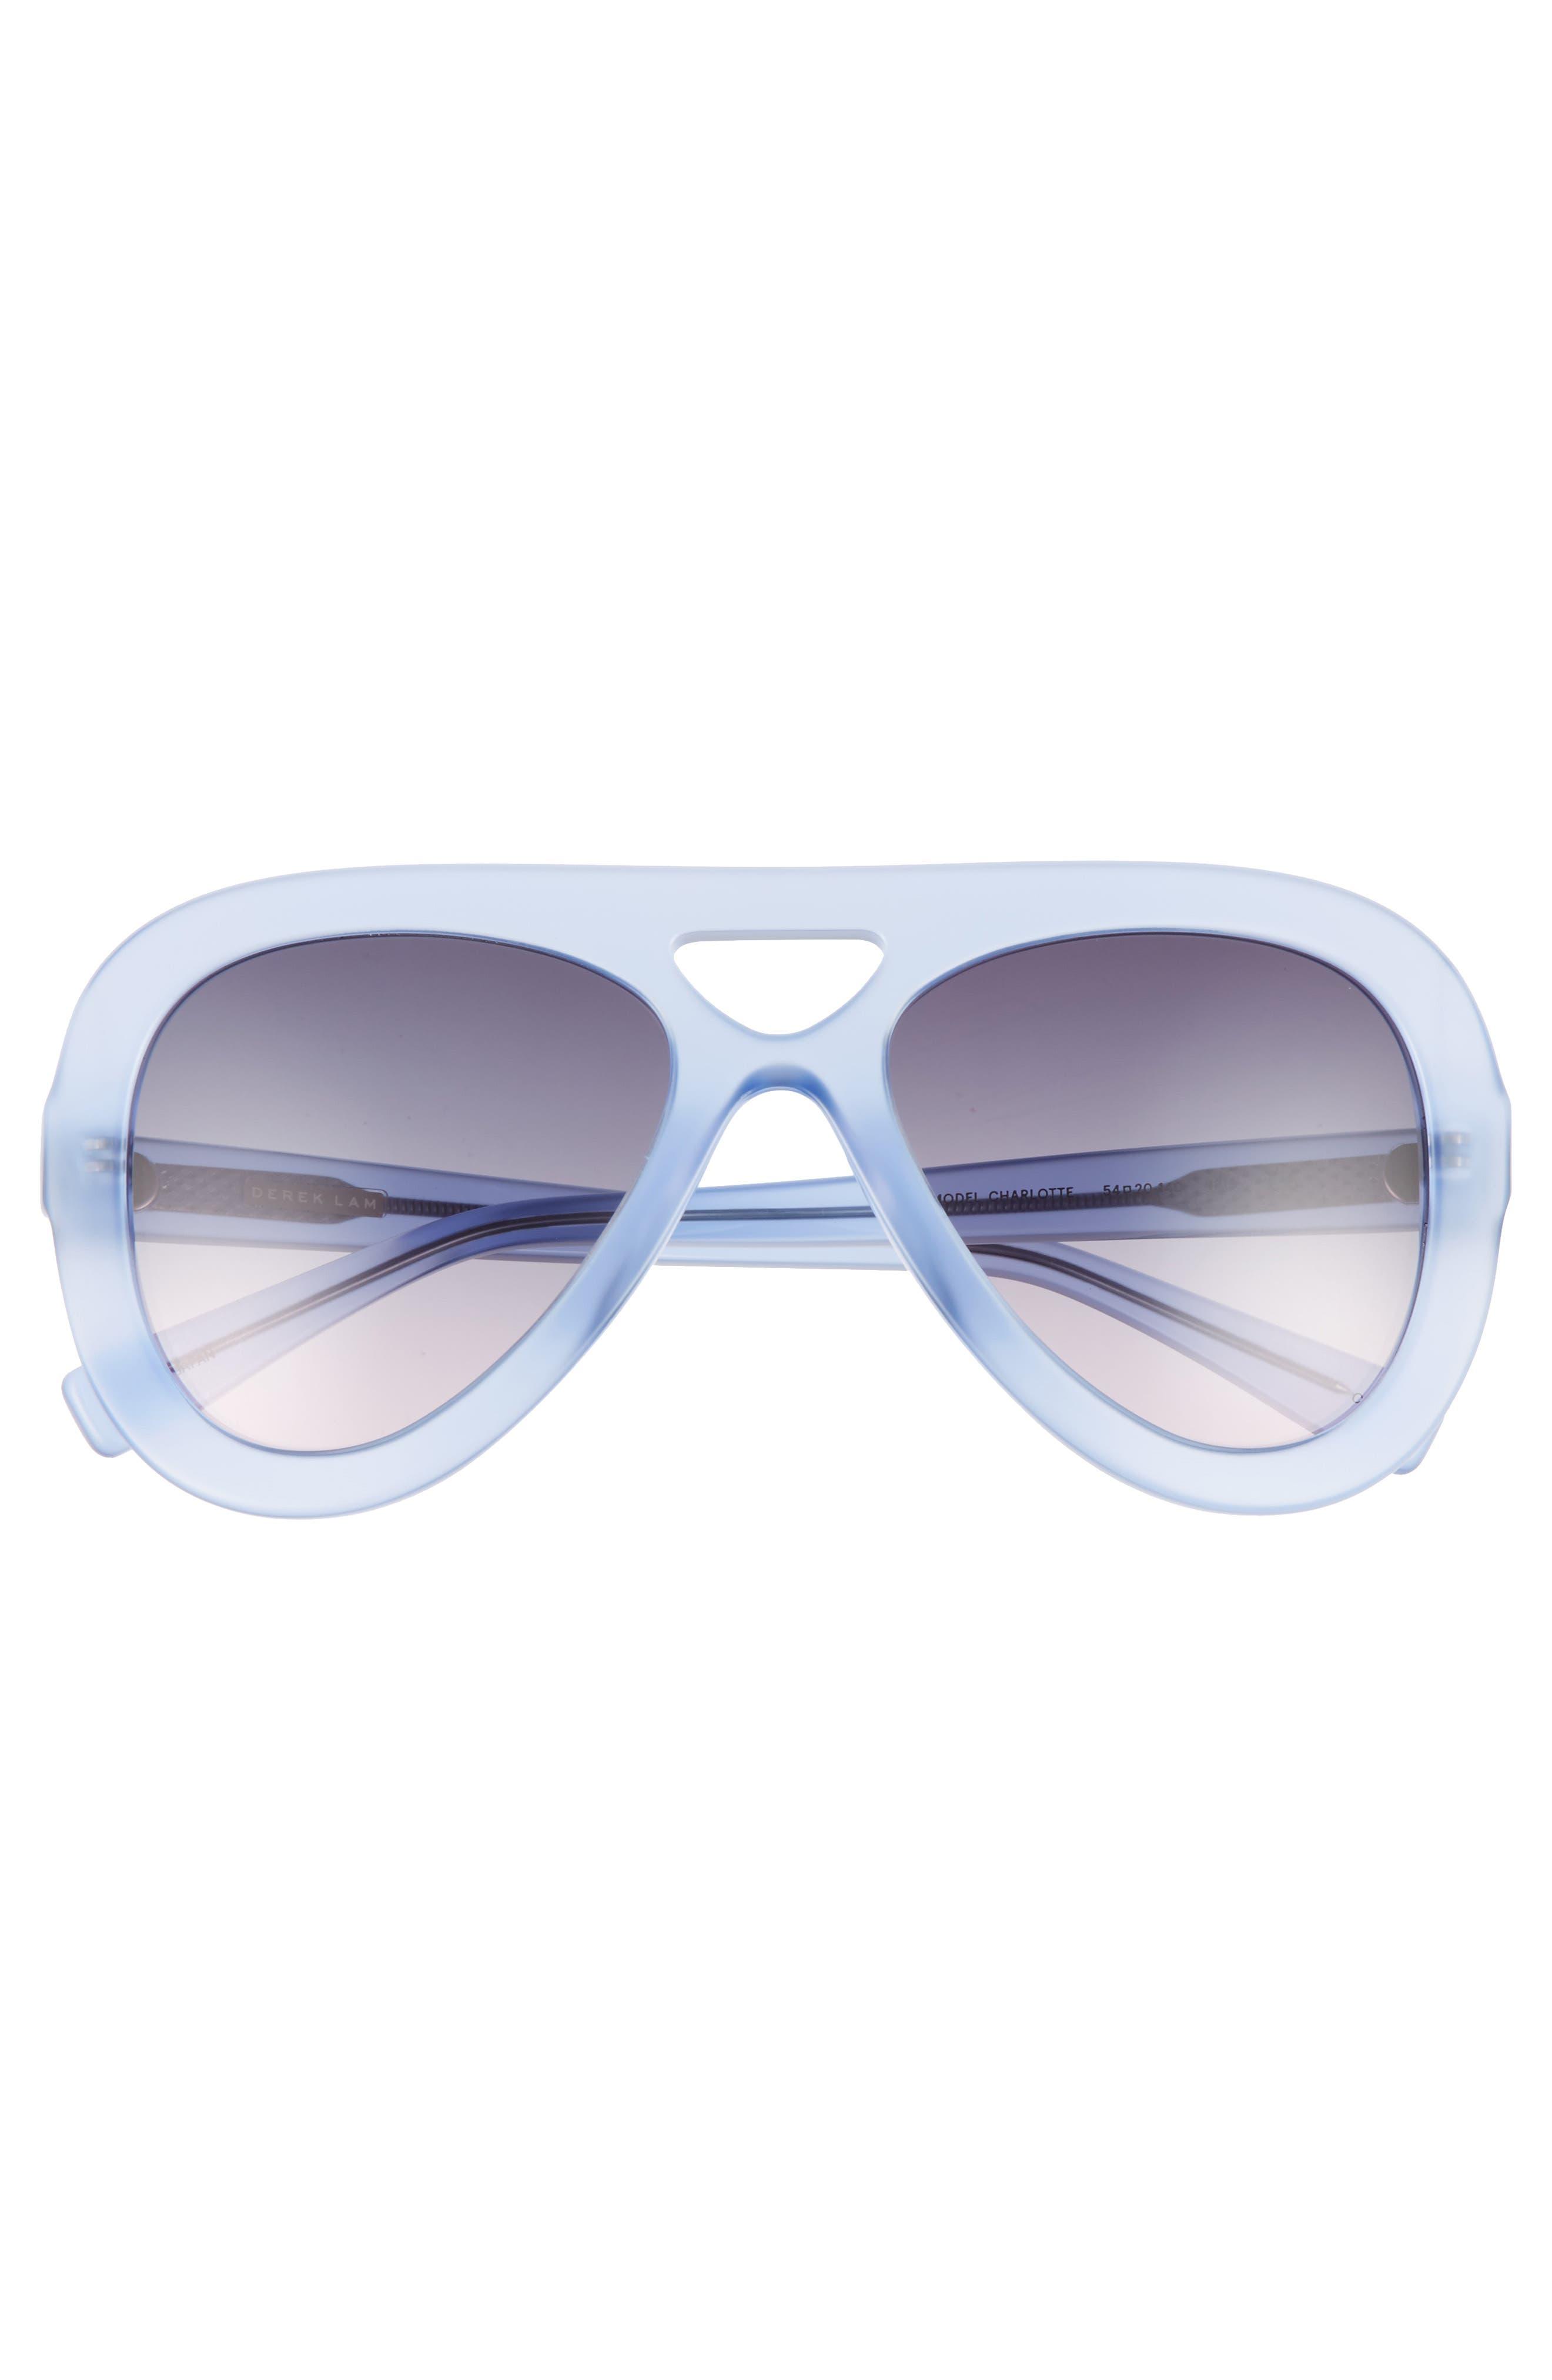 54mm Aviator Sunglasses,                             Alternate thumbnail 3, color,                             IRIS